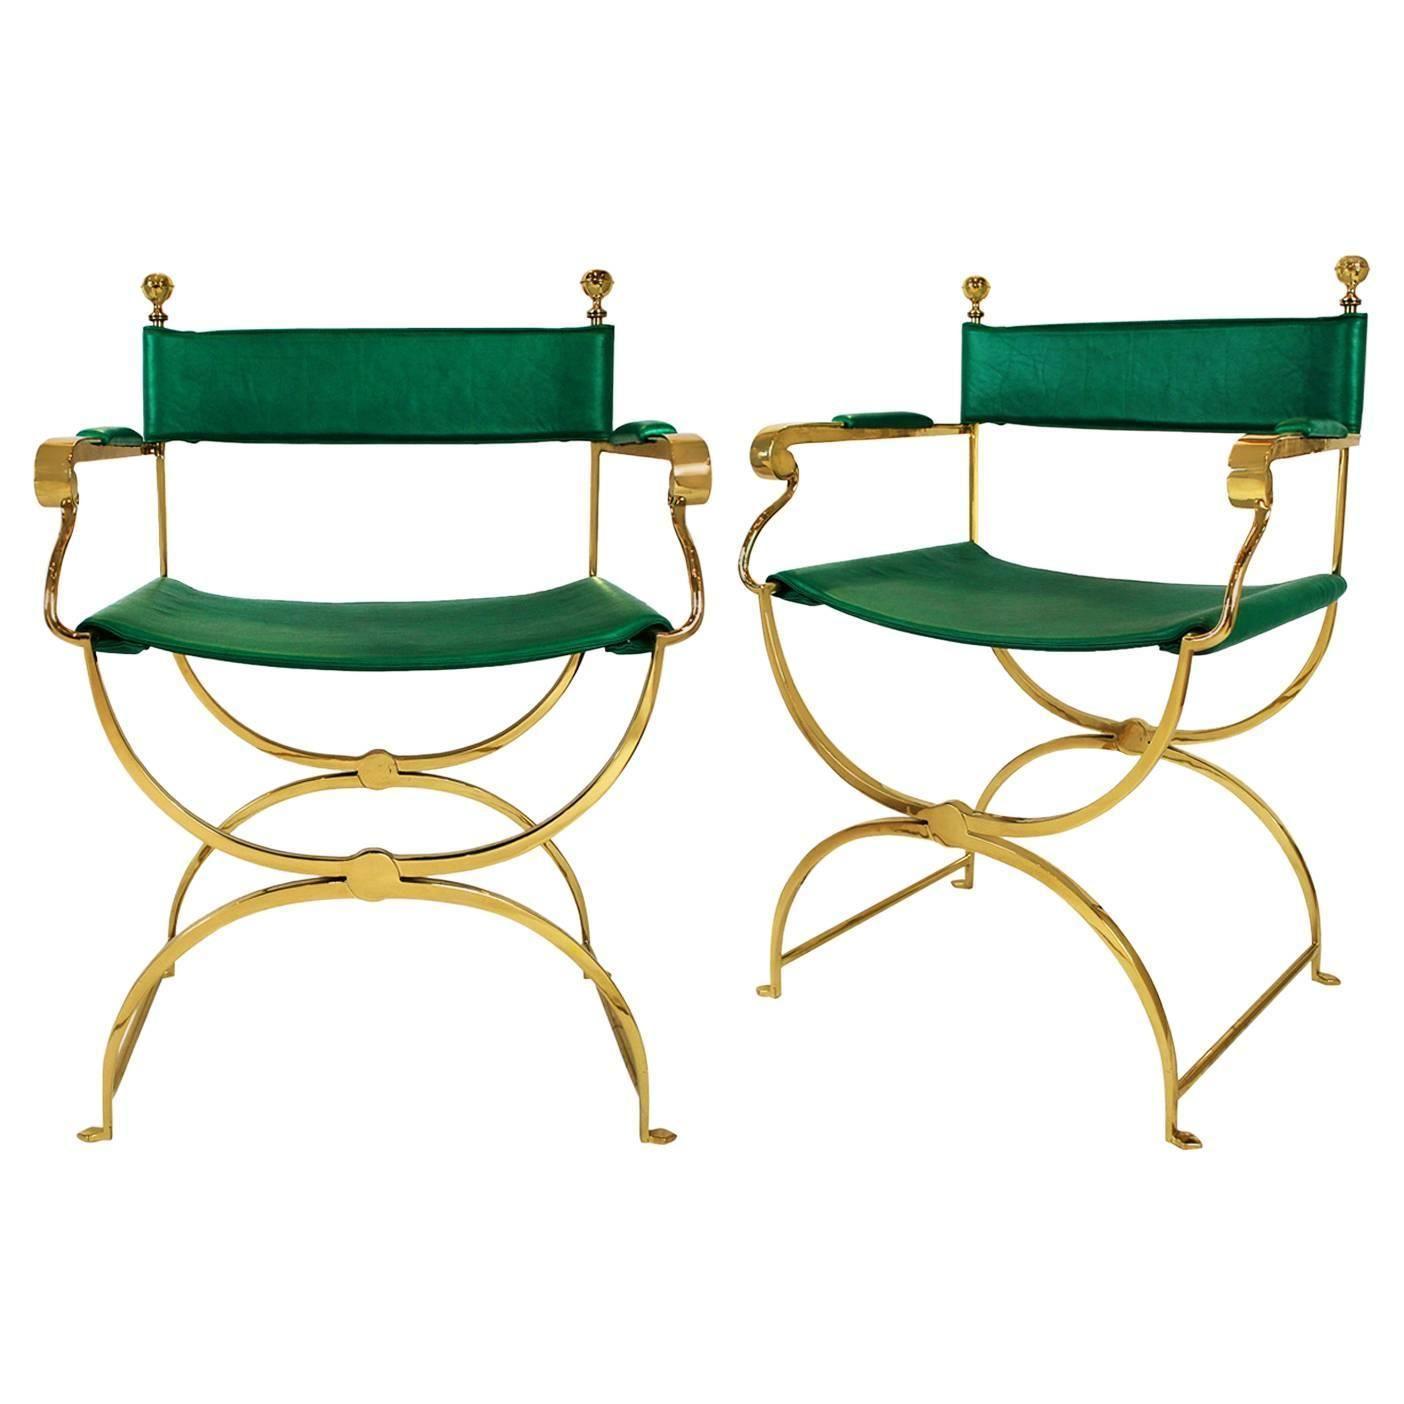 Modern savonarola chair - Valenti Pair Of Savonarola Chairs Brass Frame Circa 1980